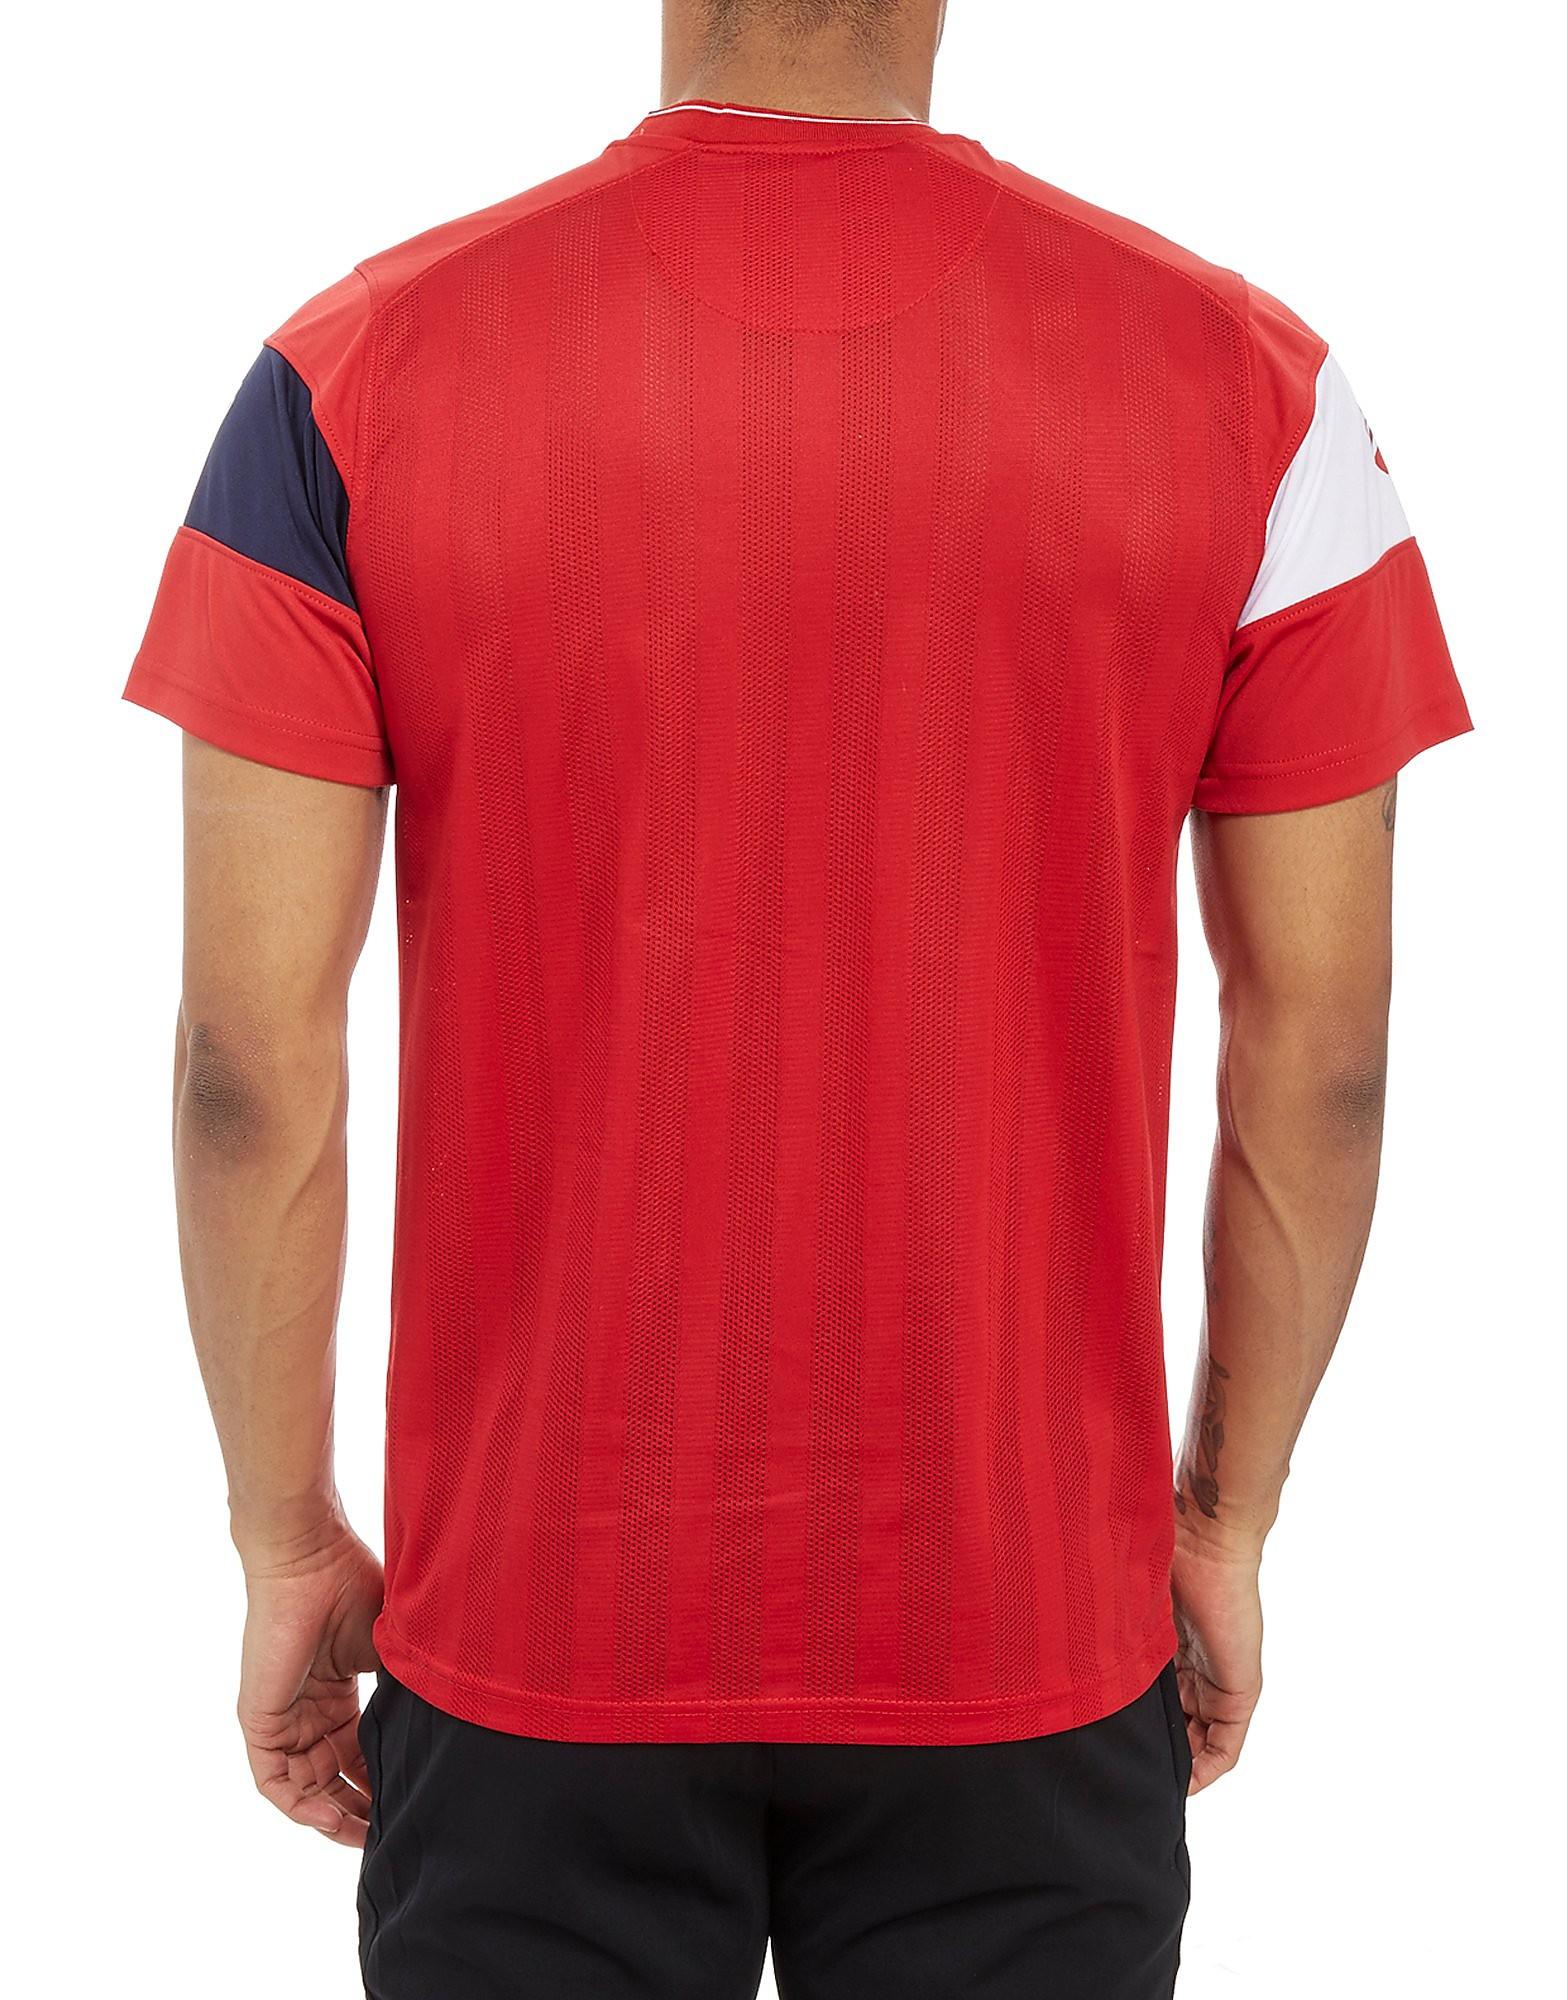 Bristol Sport Bristol City Shirt